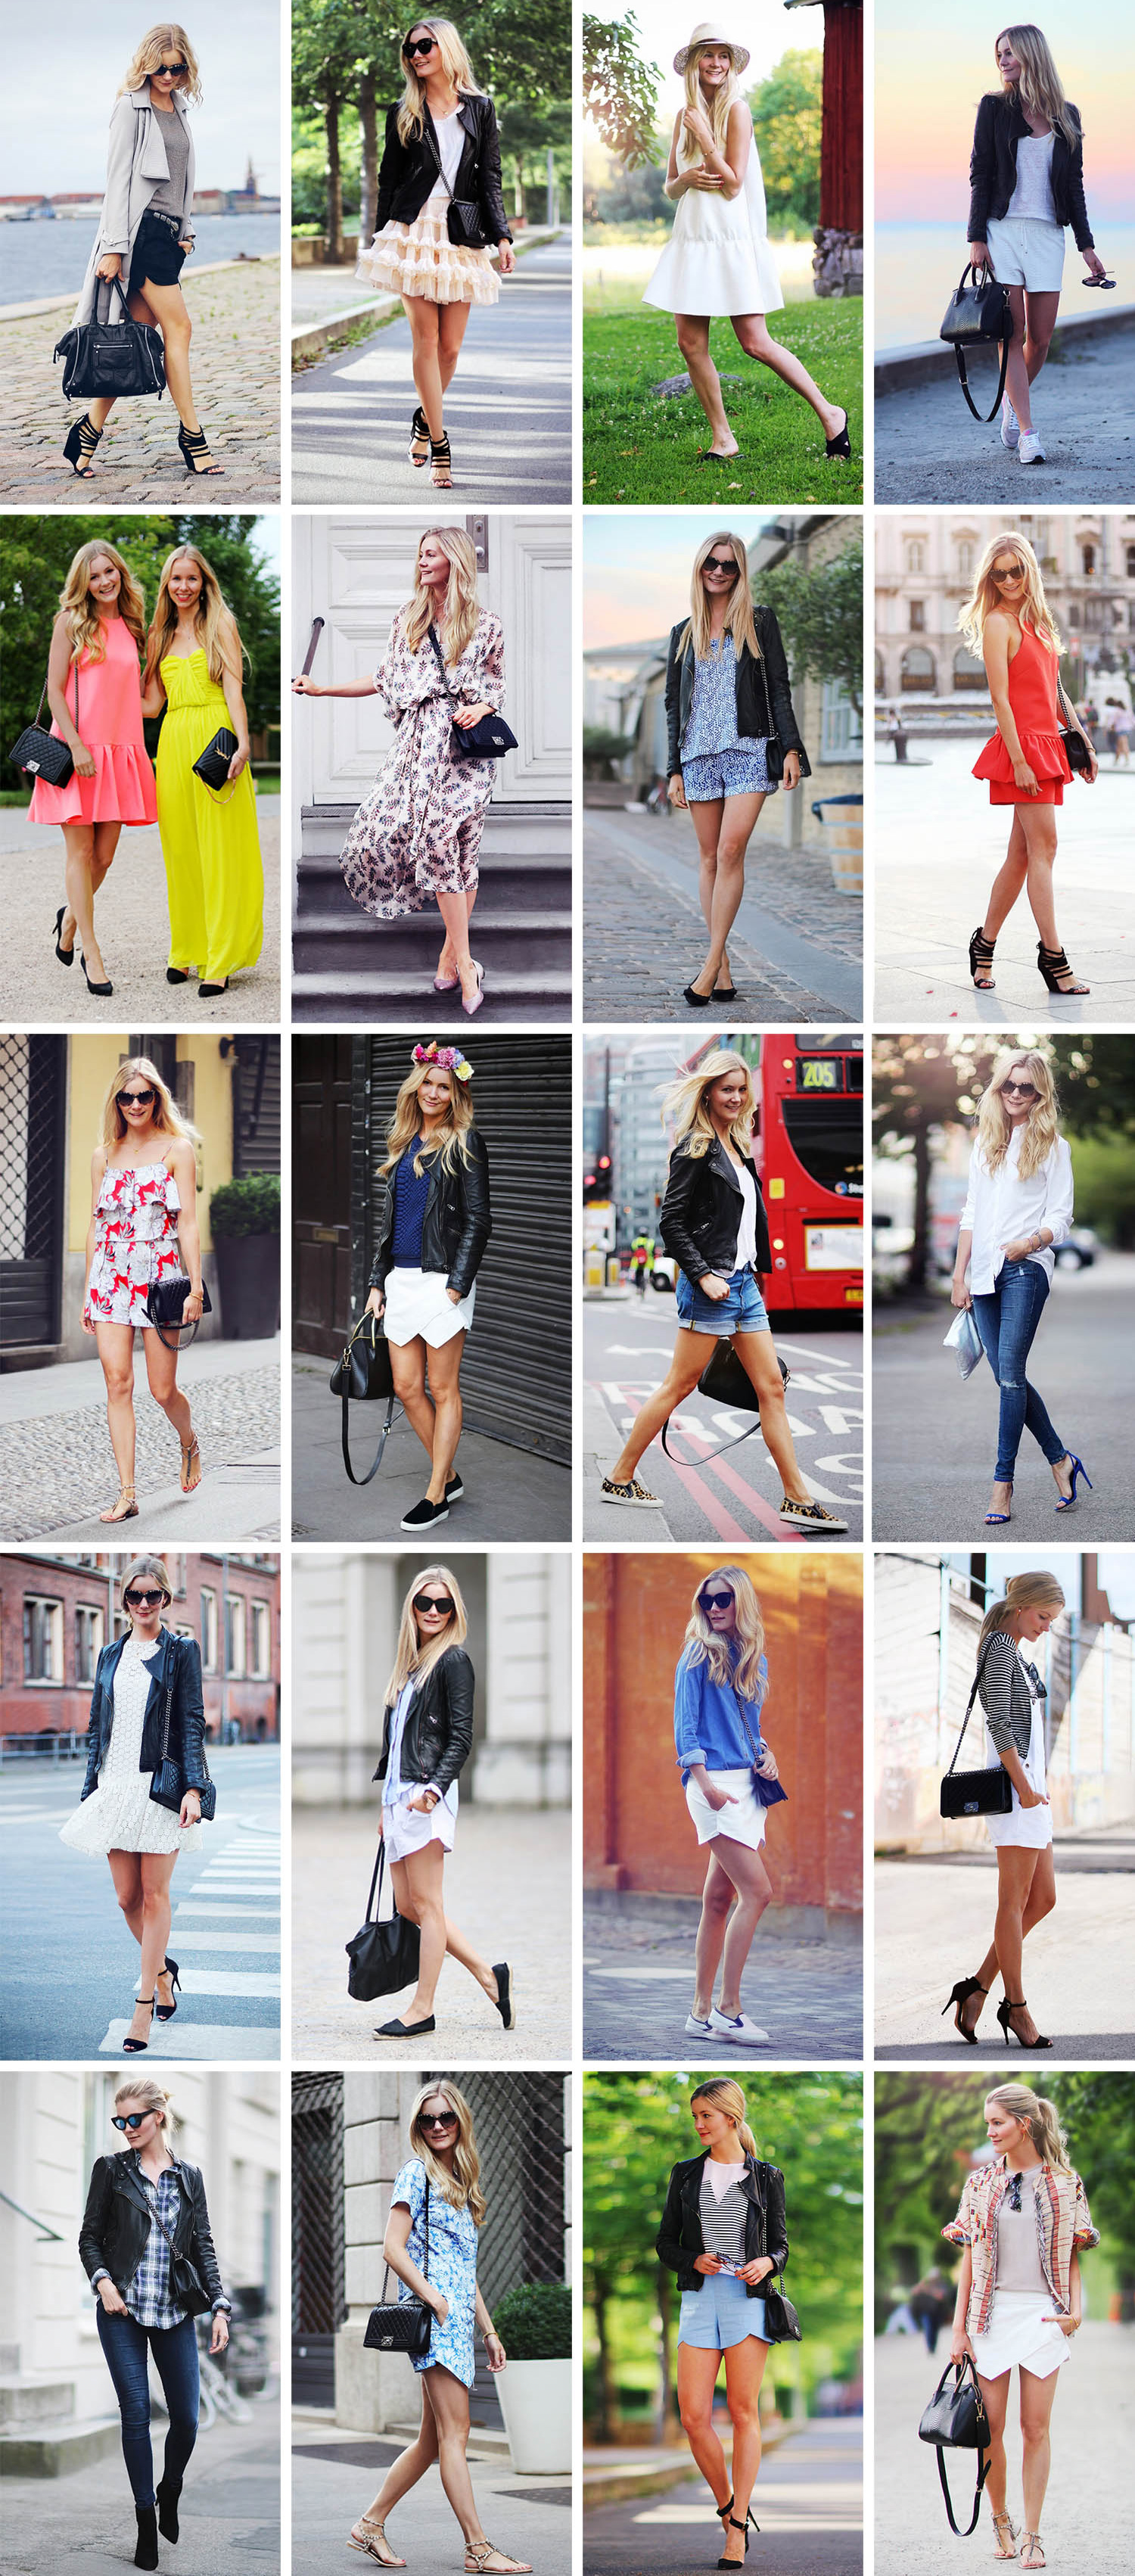 worlds-biggest-fashion-blogger@2x